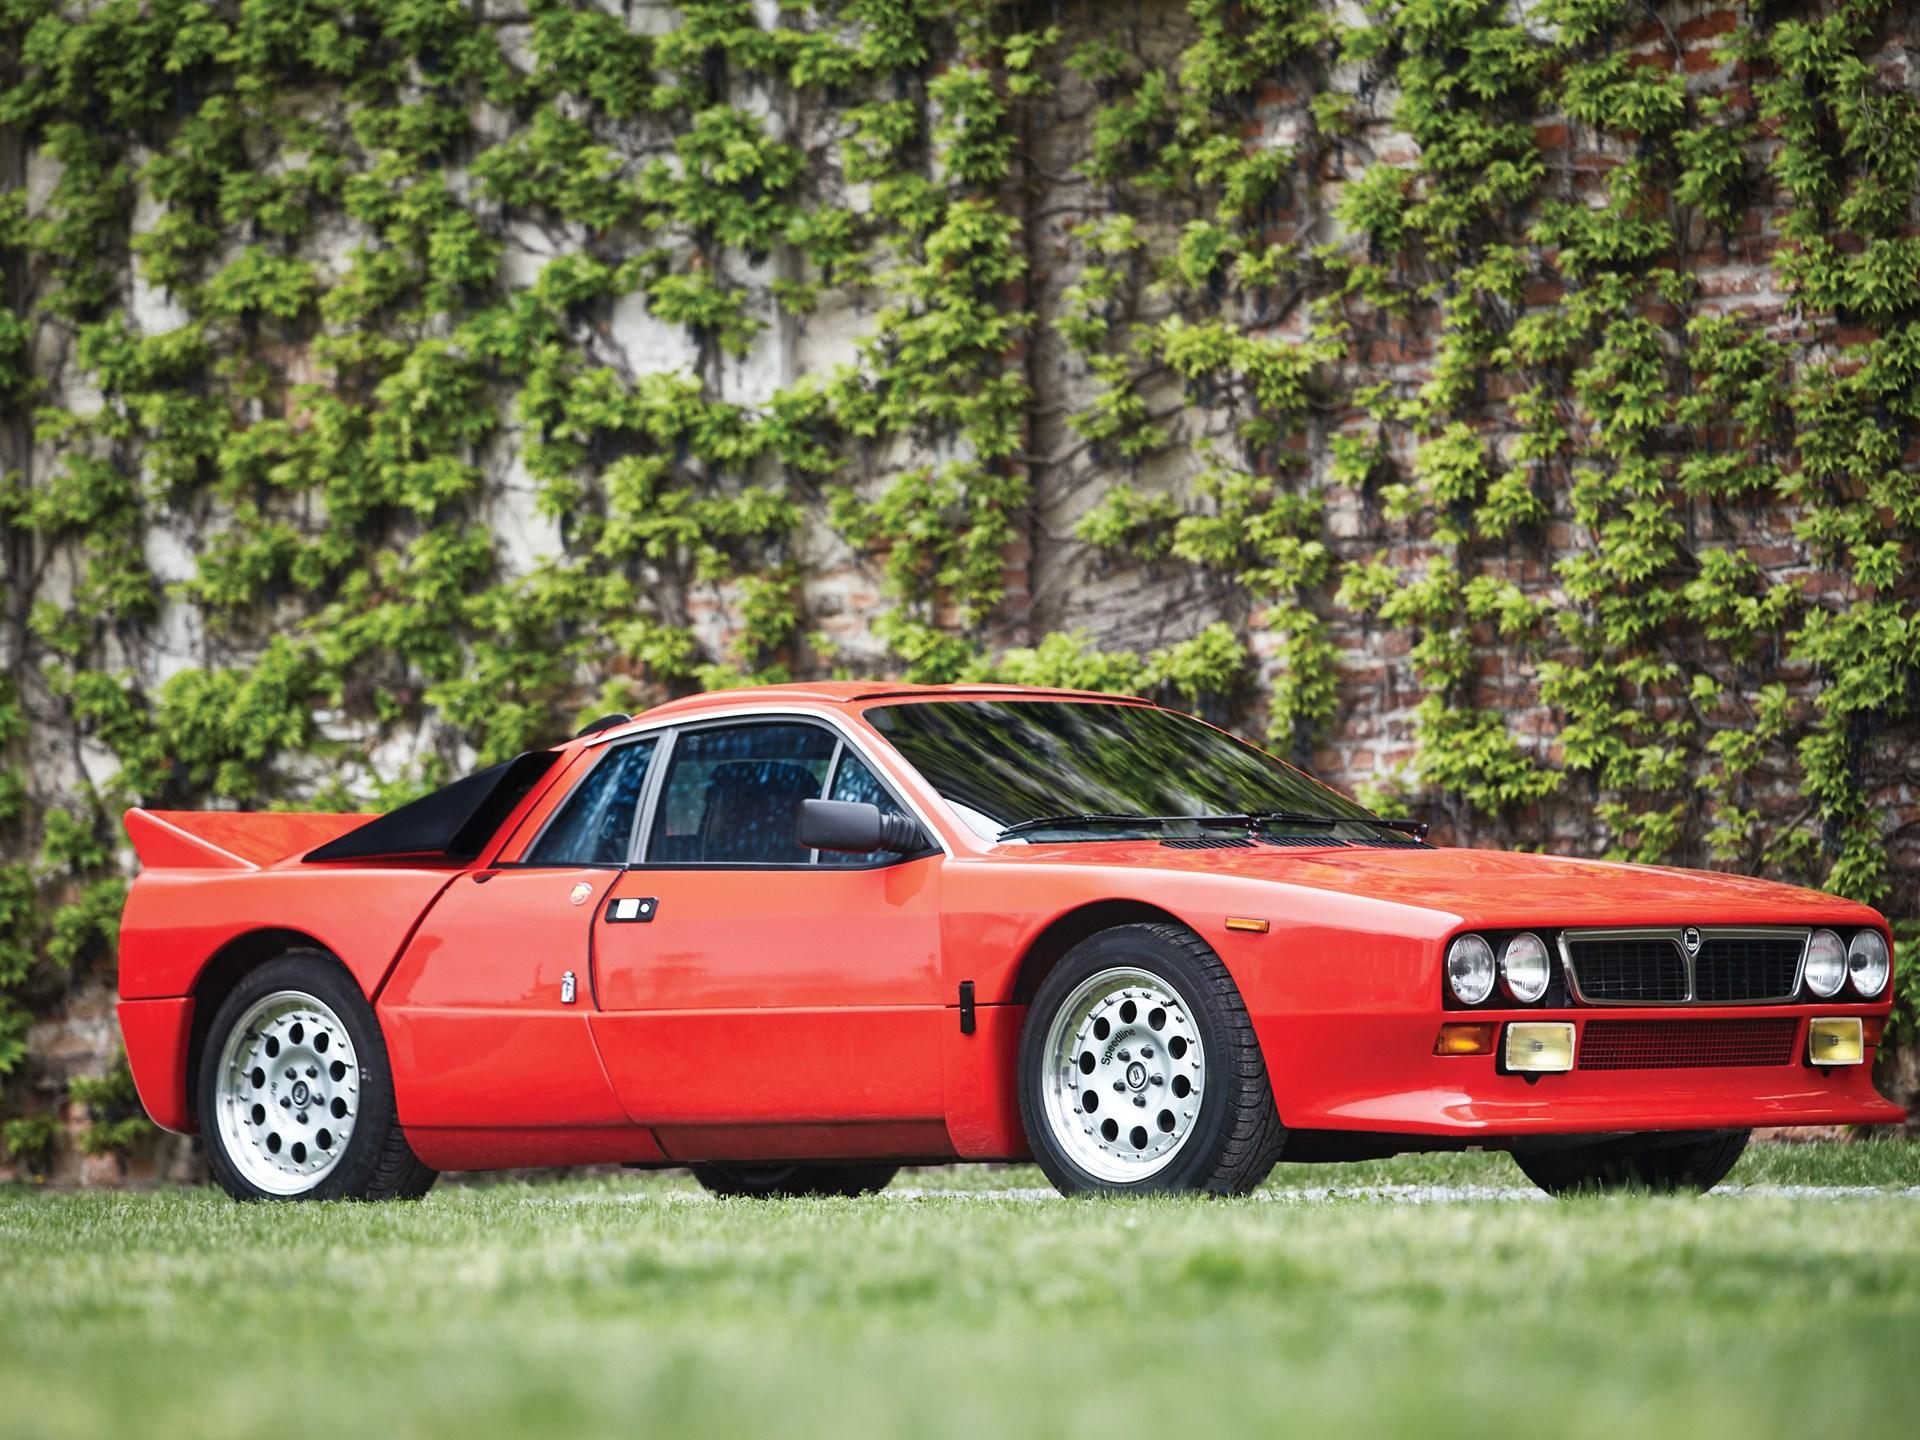 rm sotheby's - 1982 lancia rally 037 stradale | monaco 2016